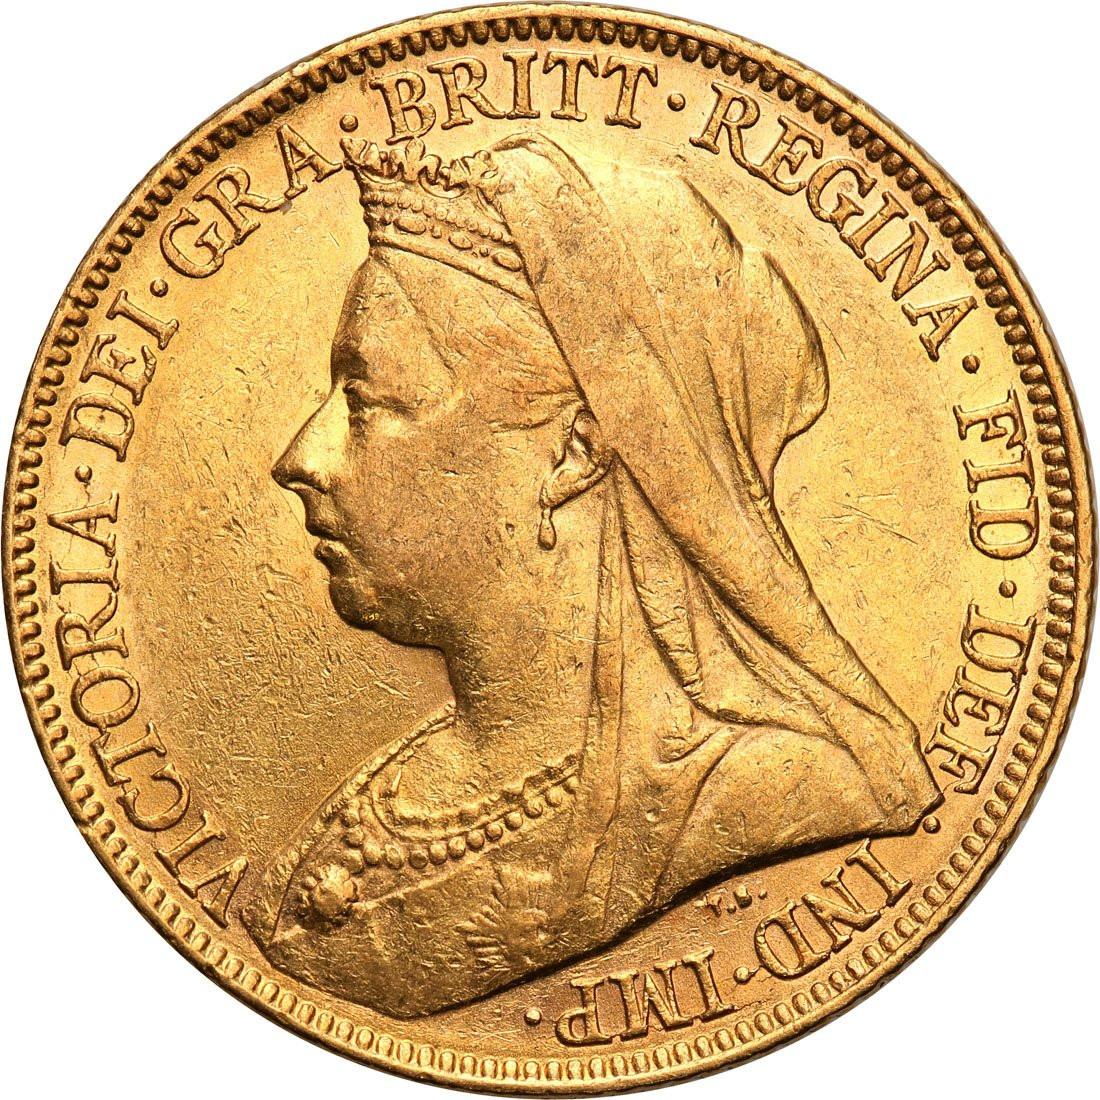 Wielka Brytania Victoria 1 suweren 1899